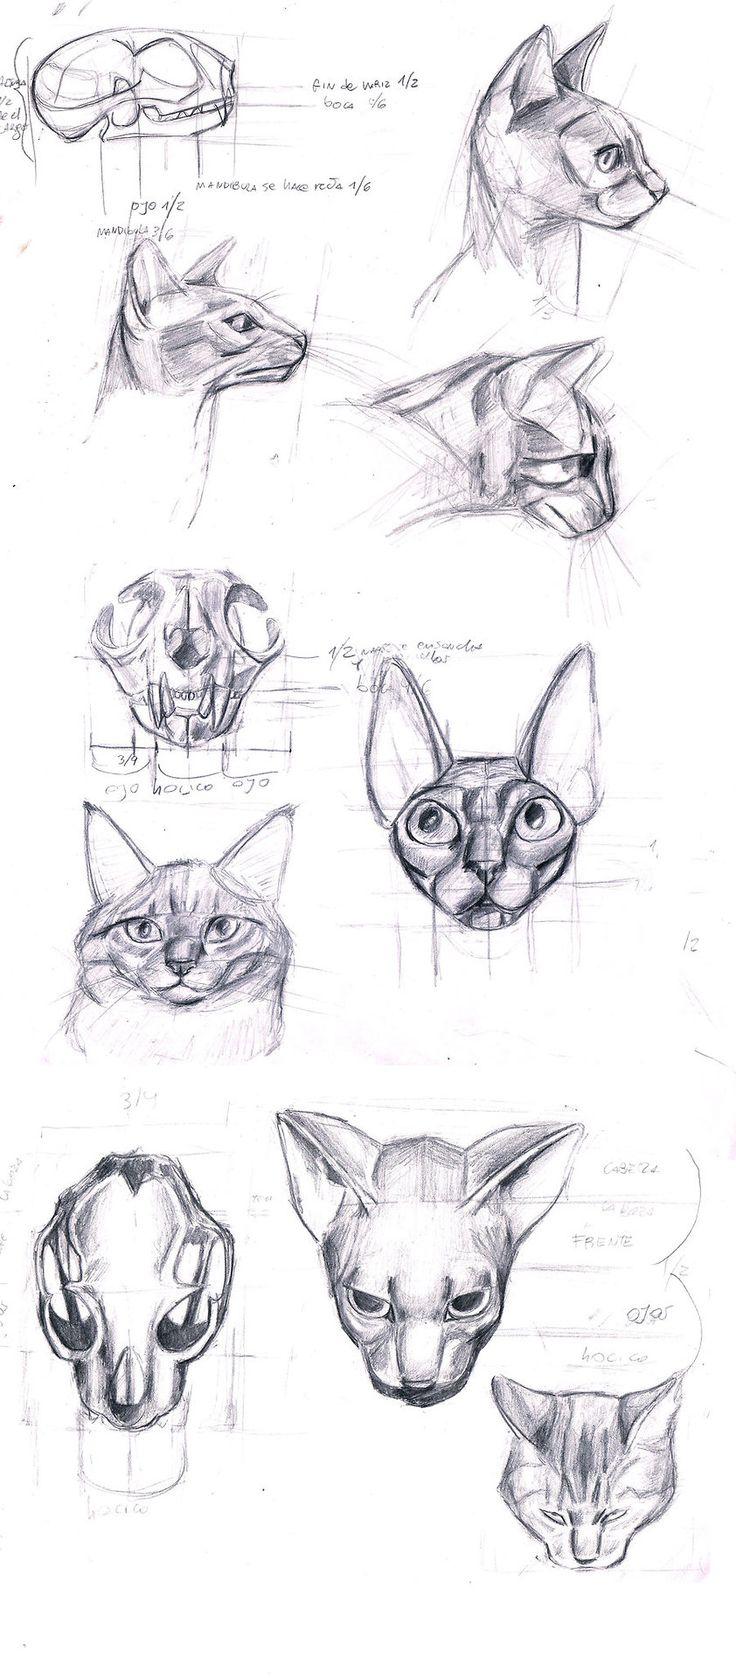 51 best creacion en proceso images on Pinterest | Animal anatomy ...